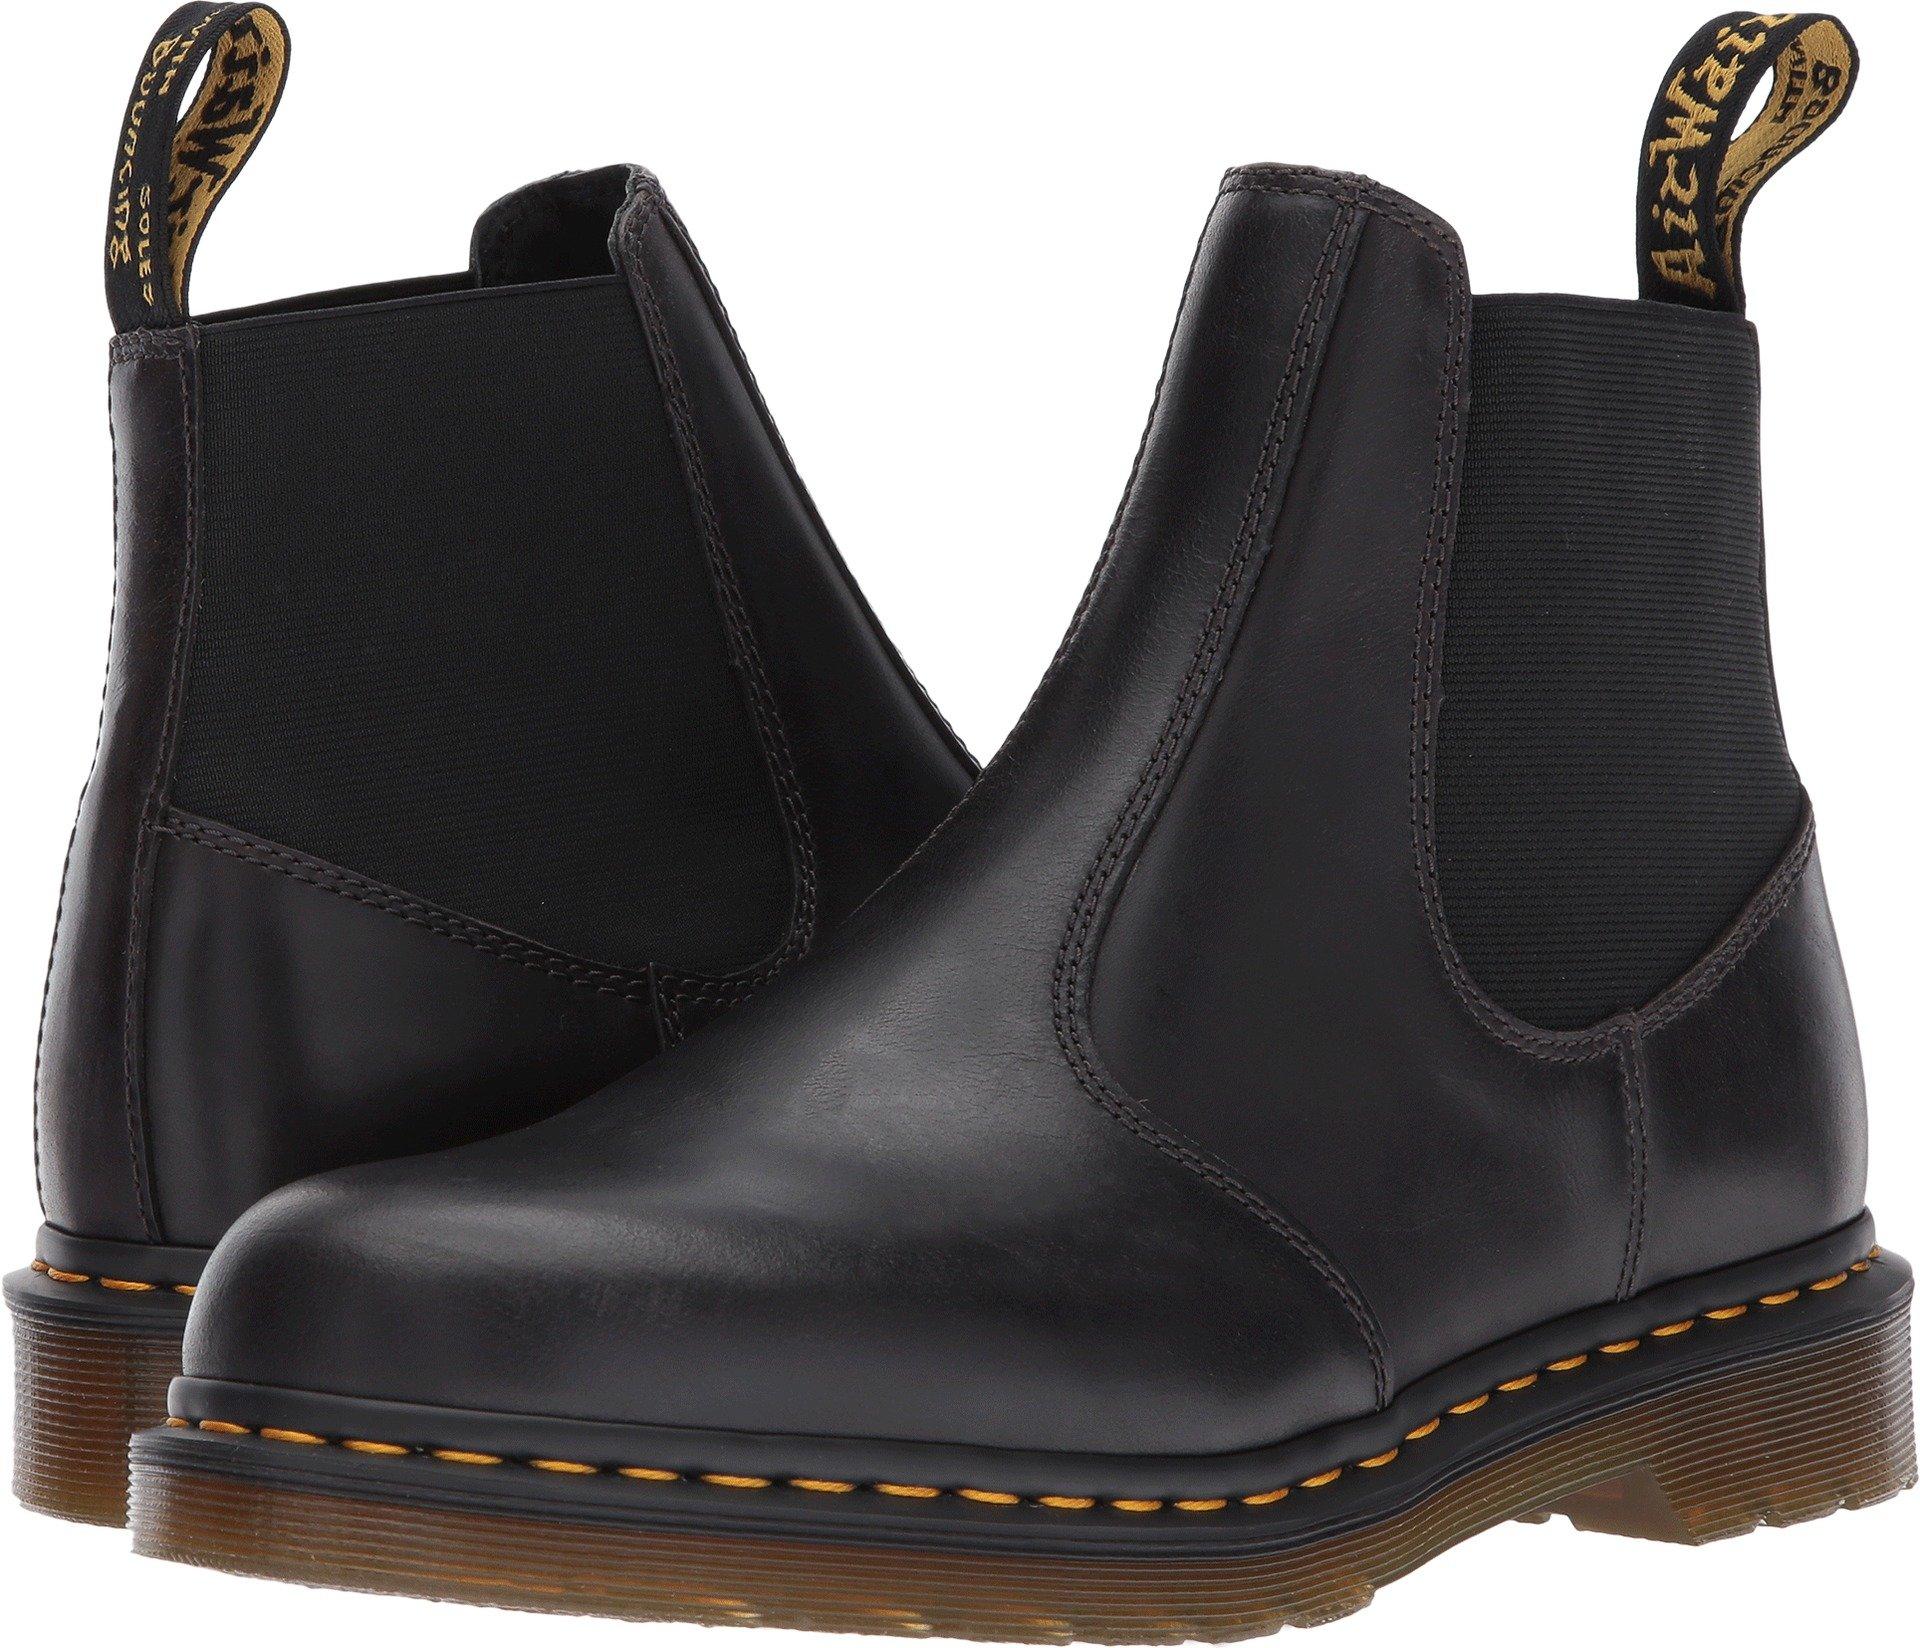 Dr. Martens Men's Hardy Grey Chelsea Boot, Gunmetal, 10 Medium UK (11 US)